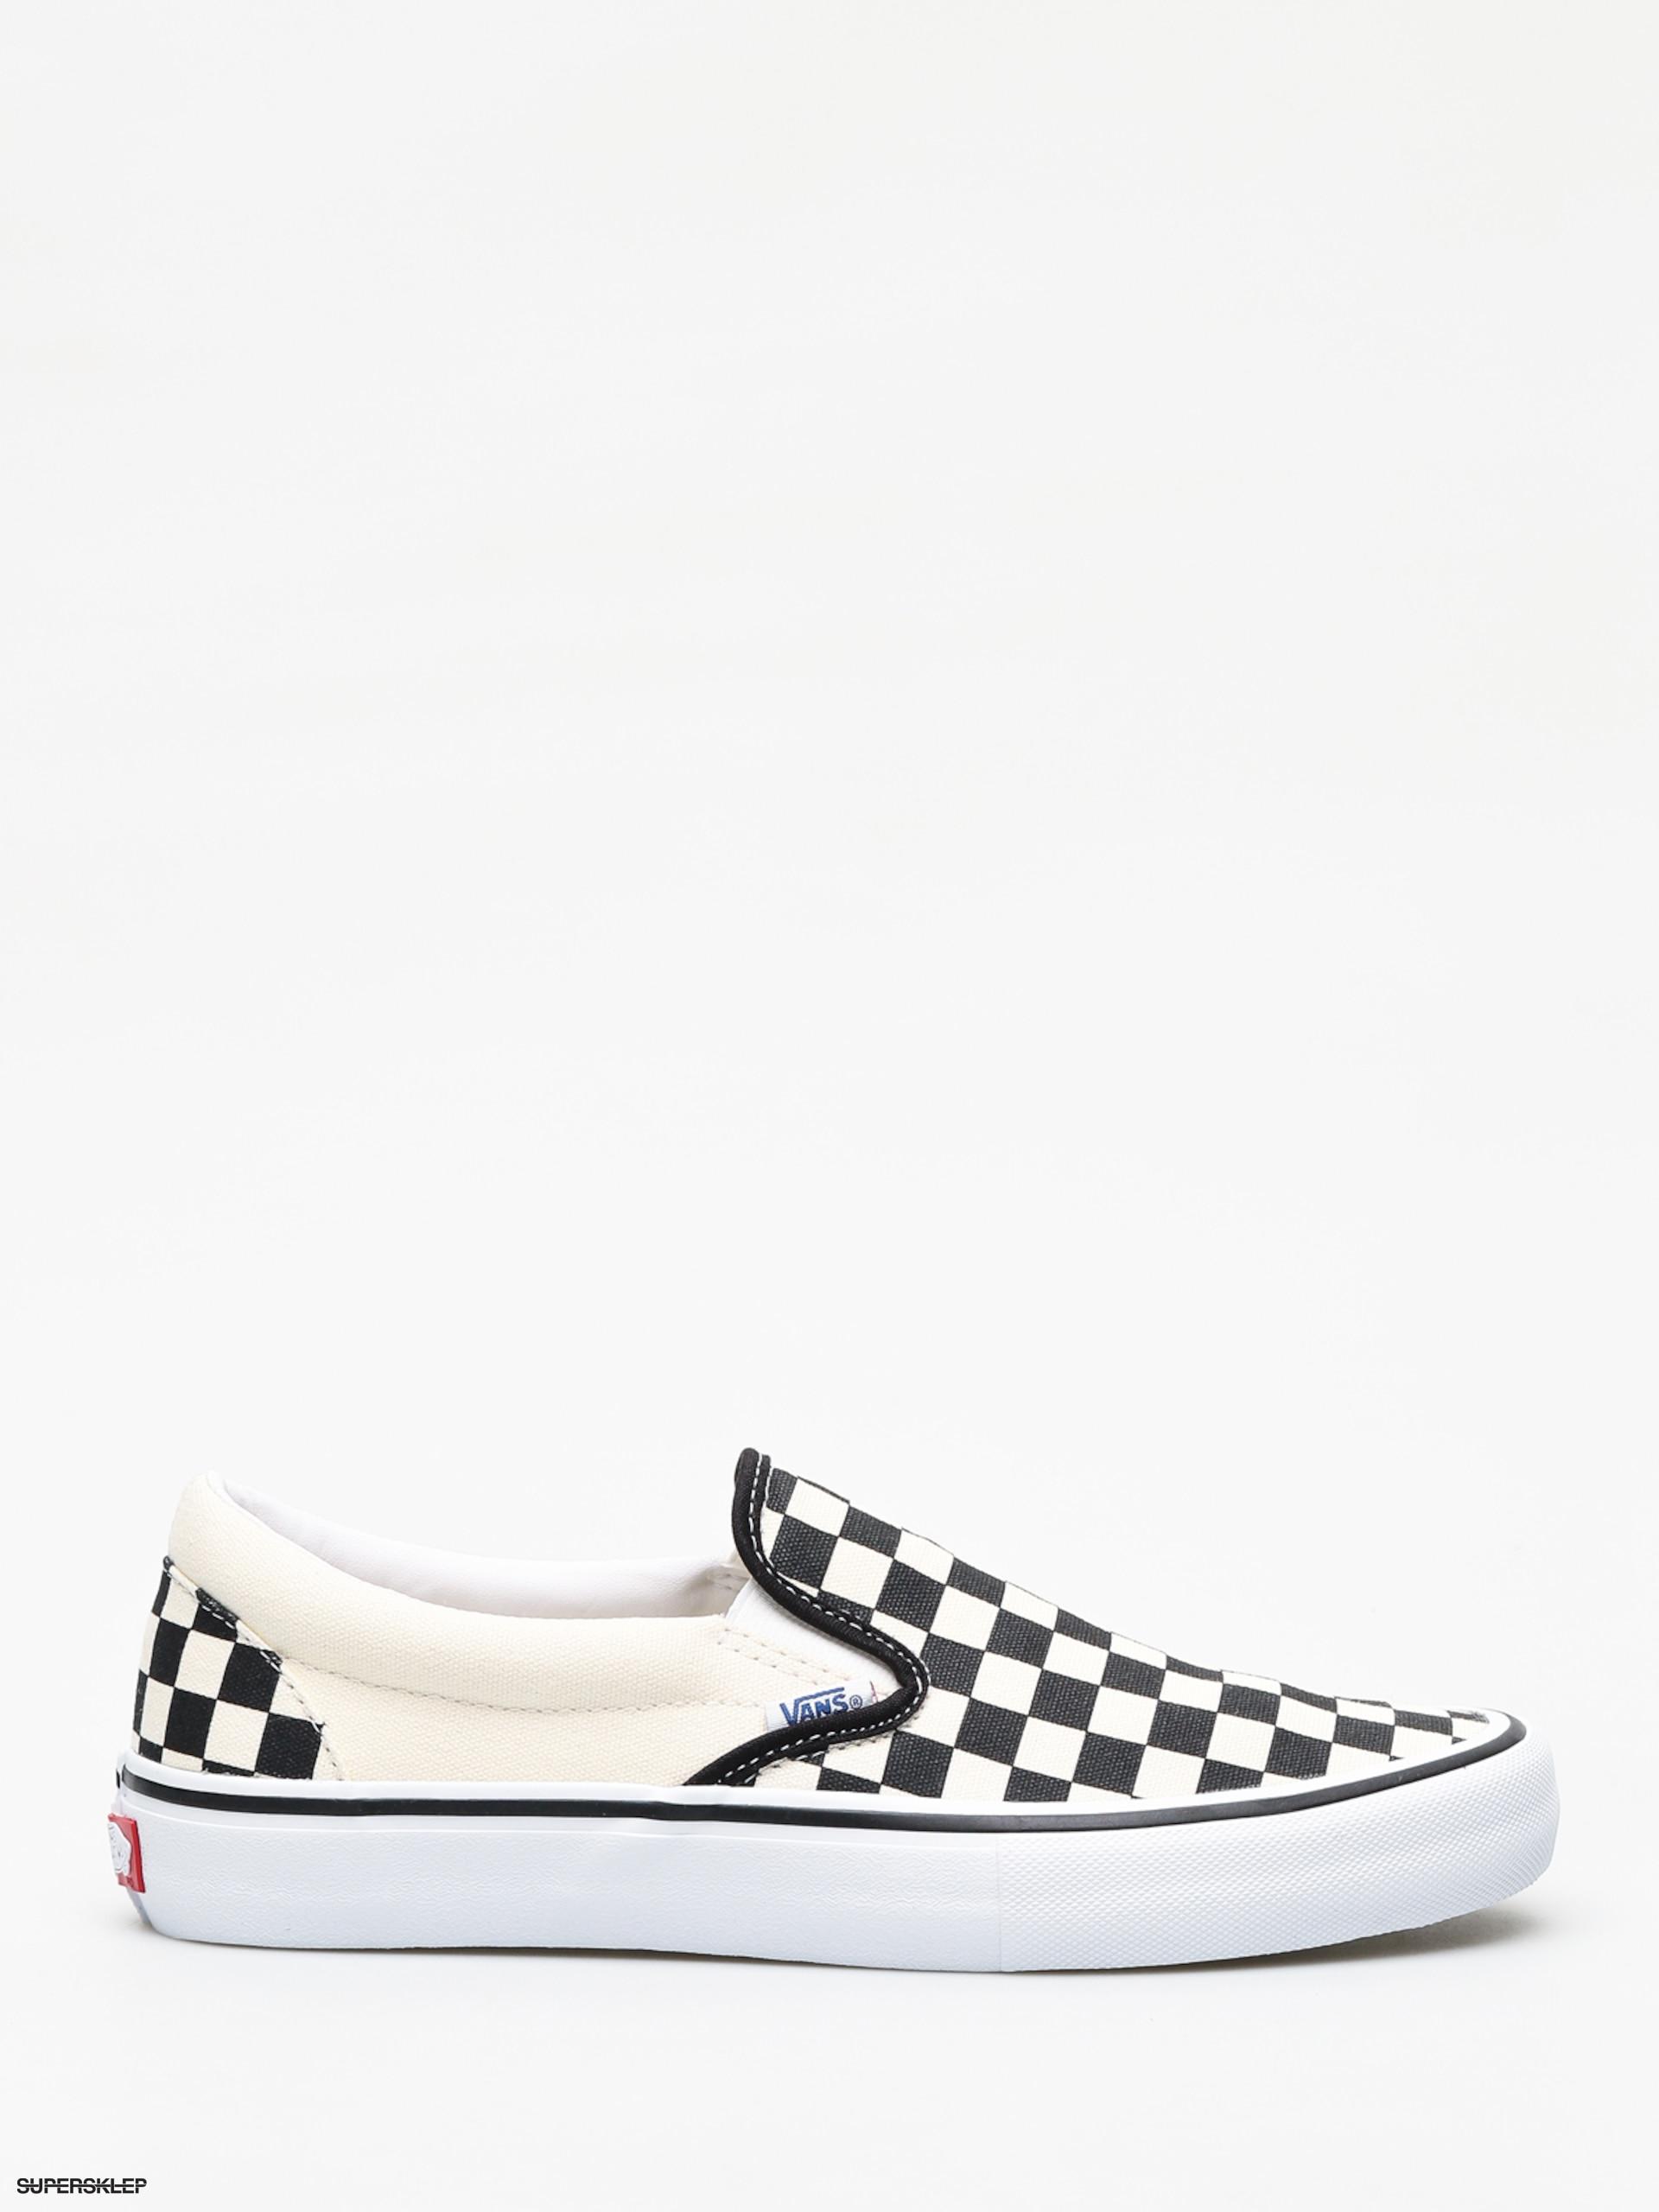 287bb6d952 Topánky Vans Slip On Pro (checkerboard black white)